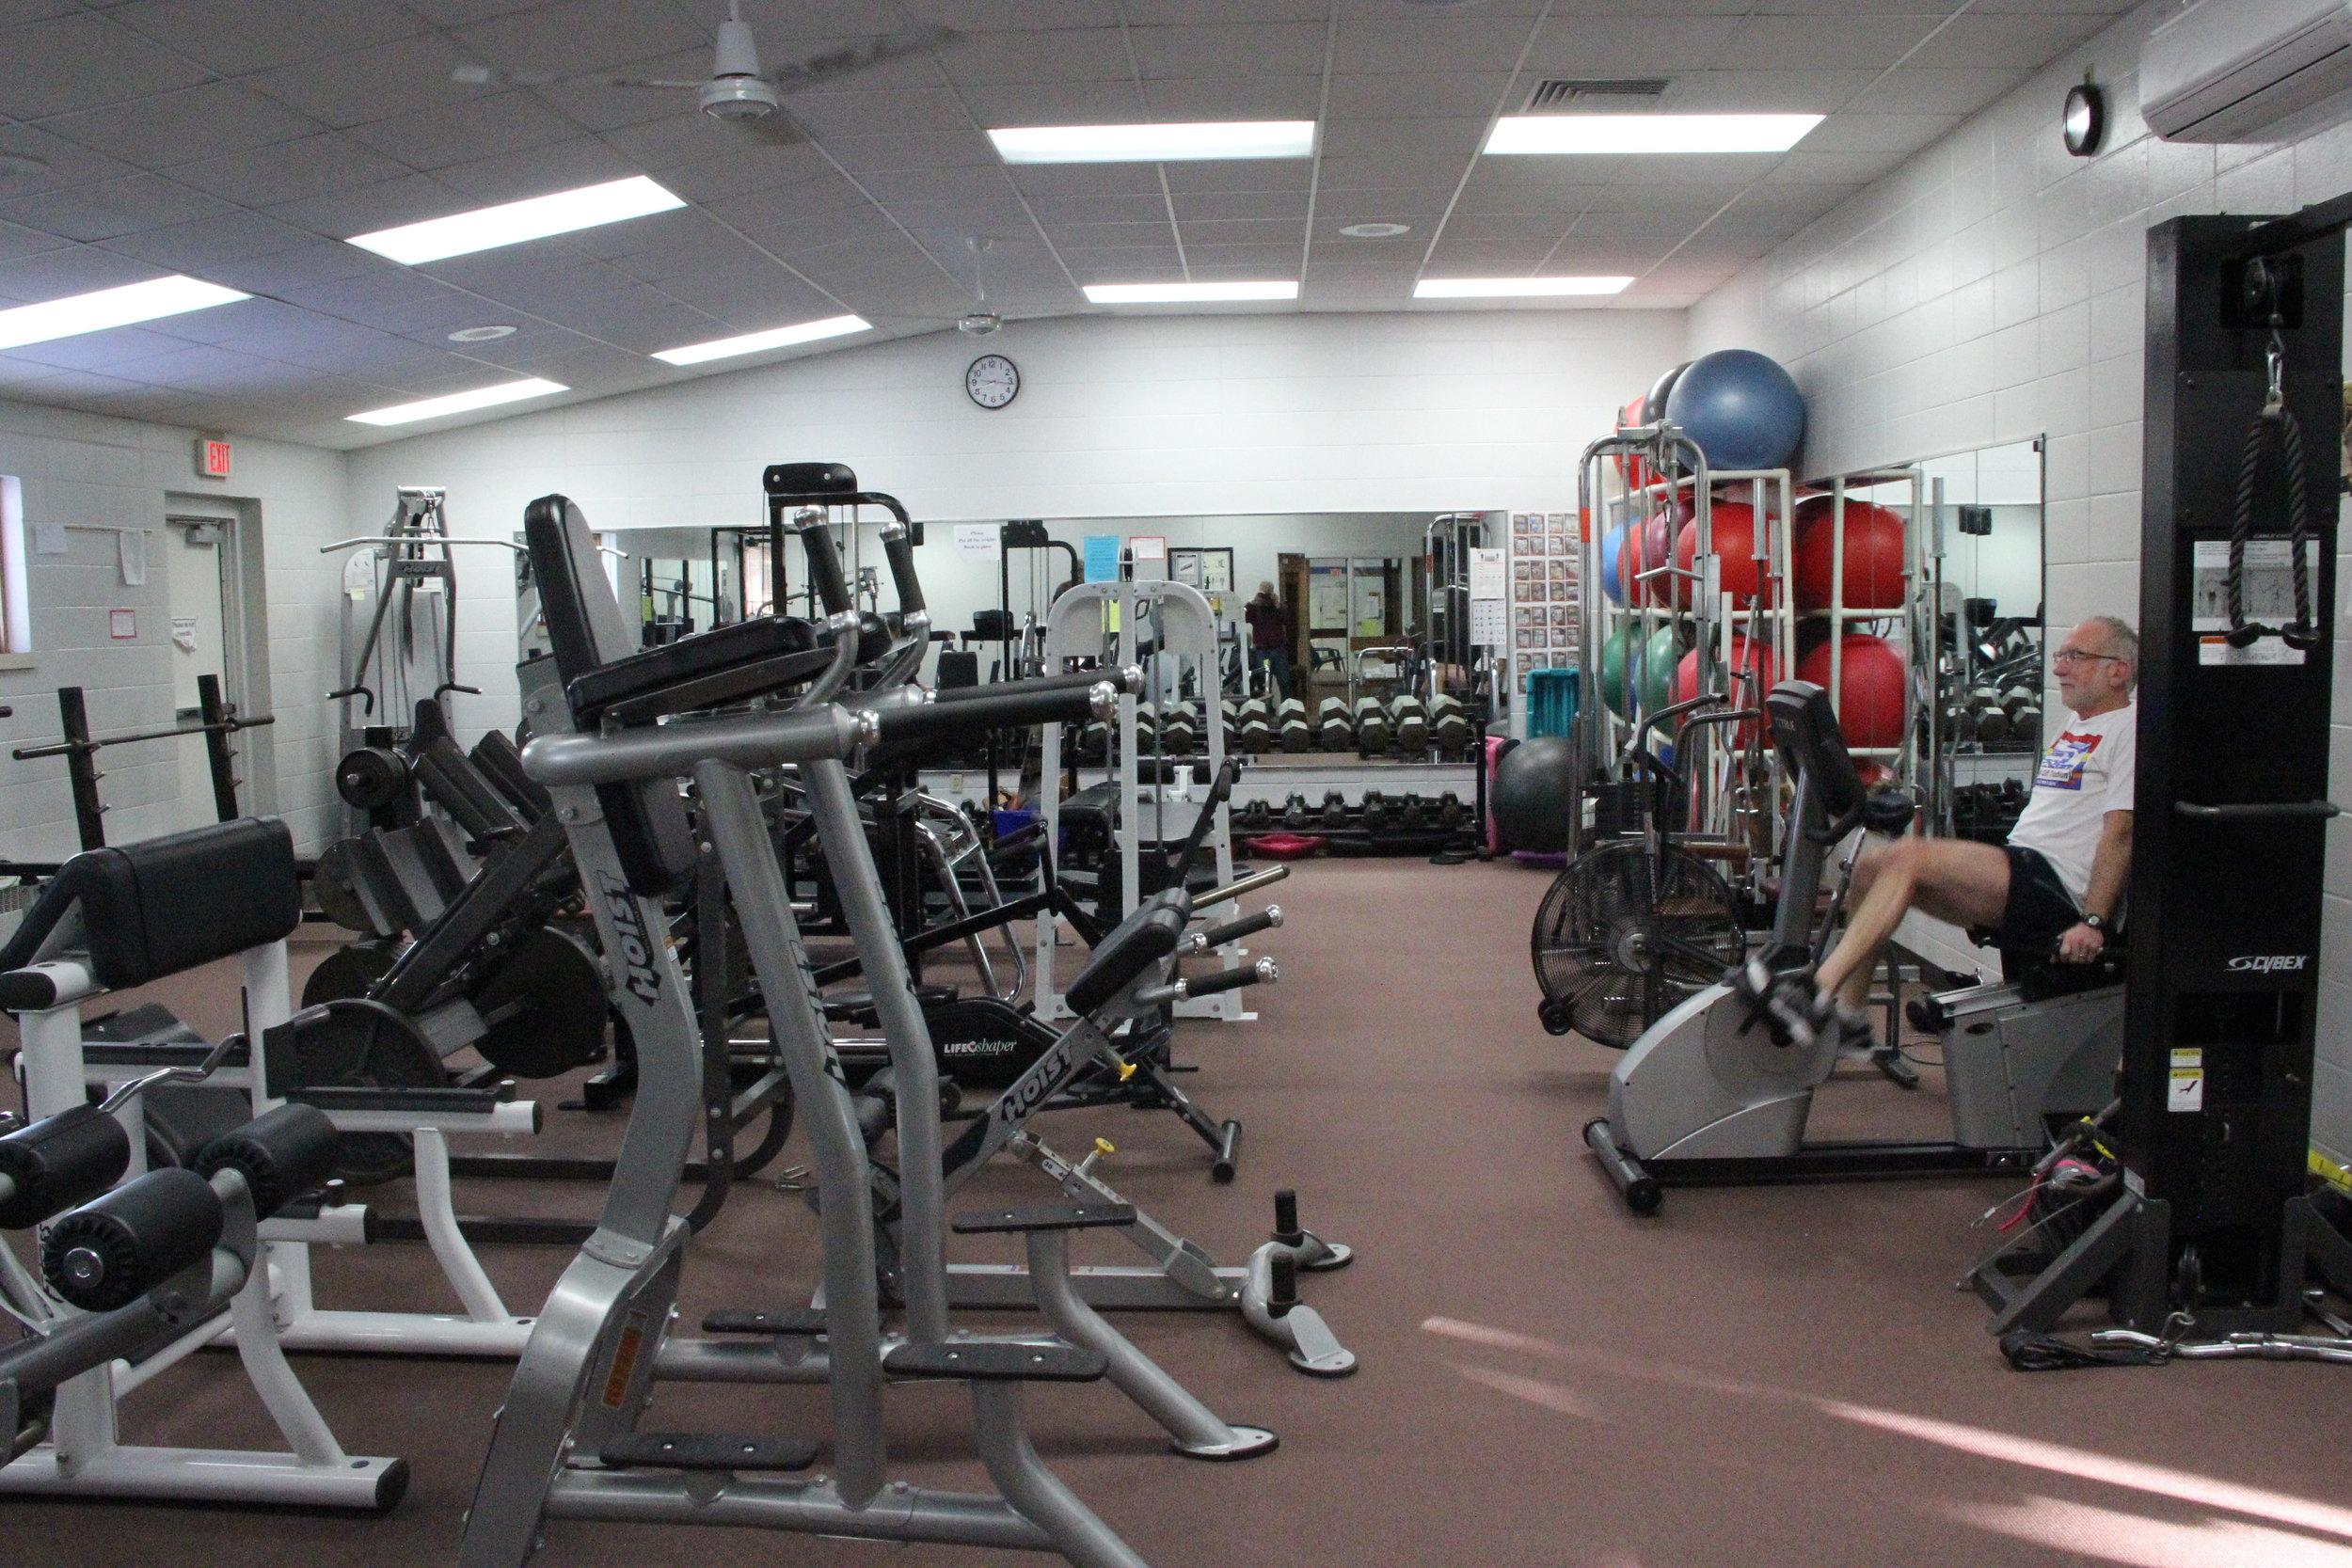 Mosling_Rec_Center_Weightroom.jpeg